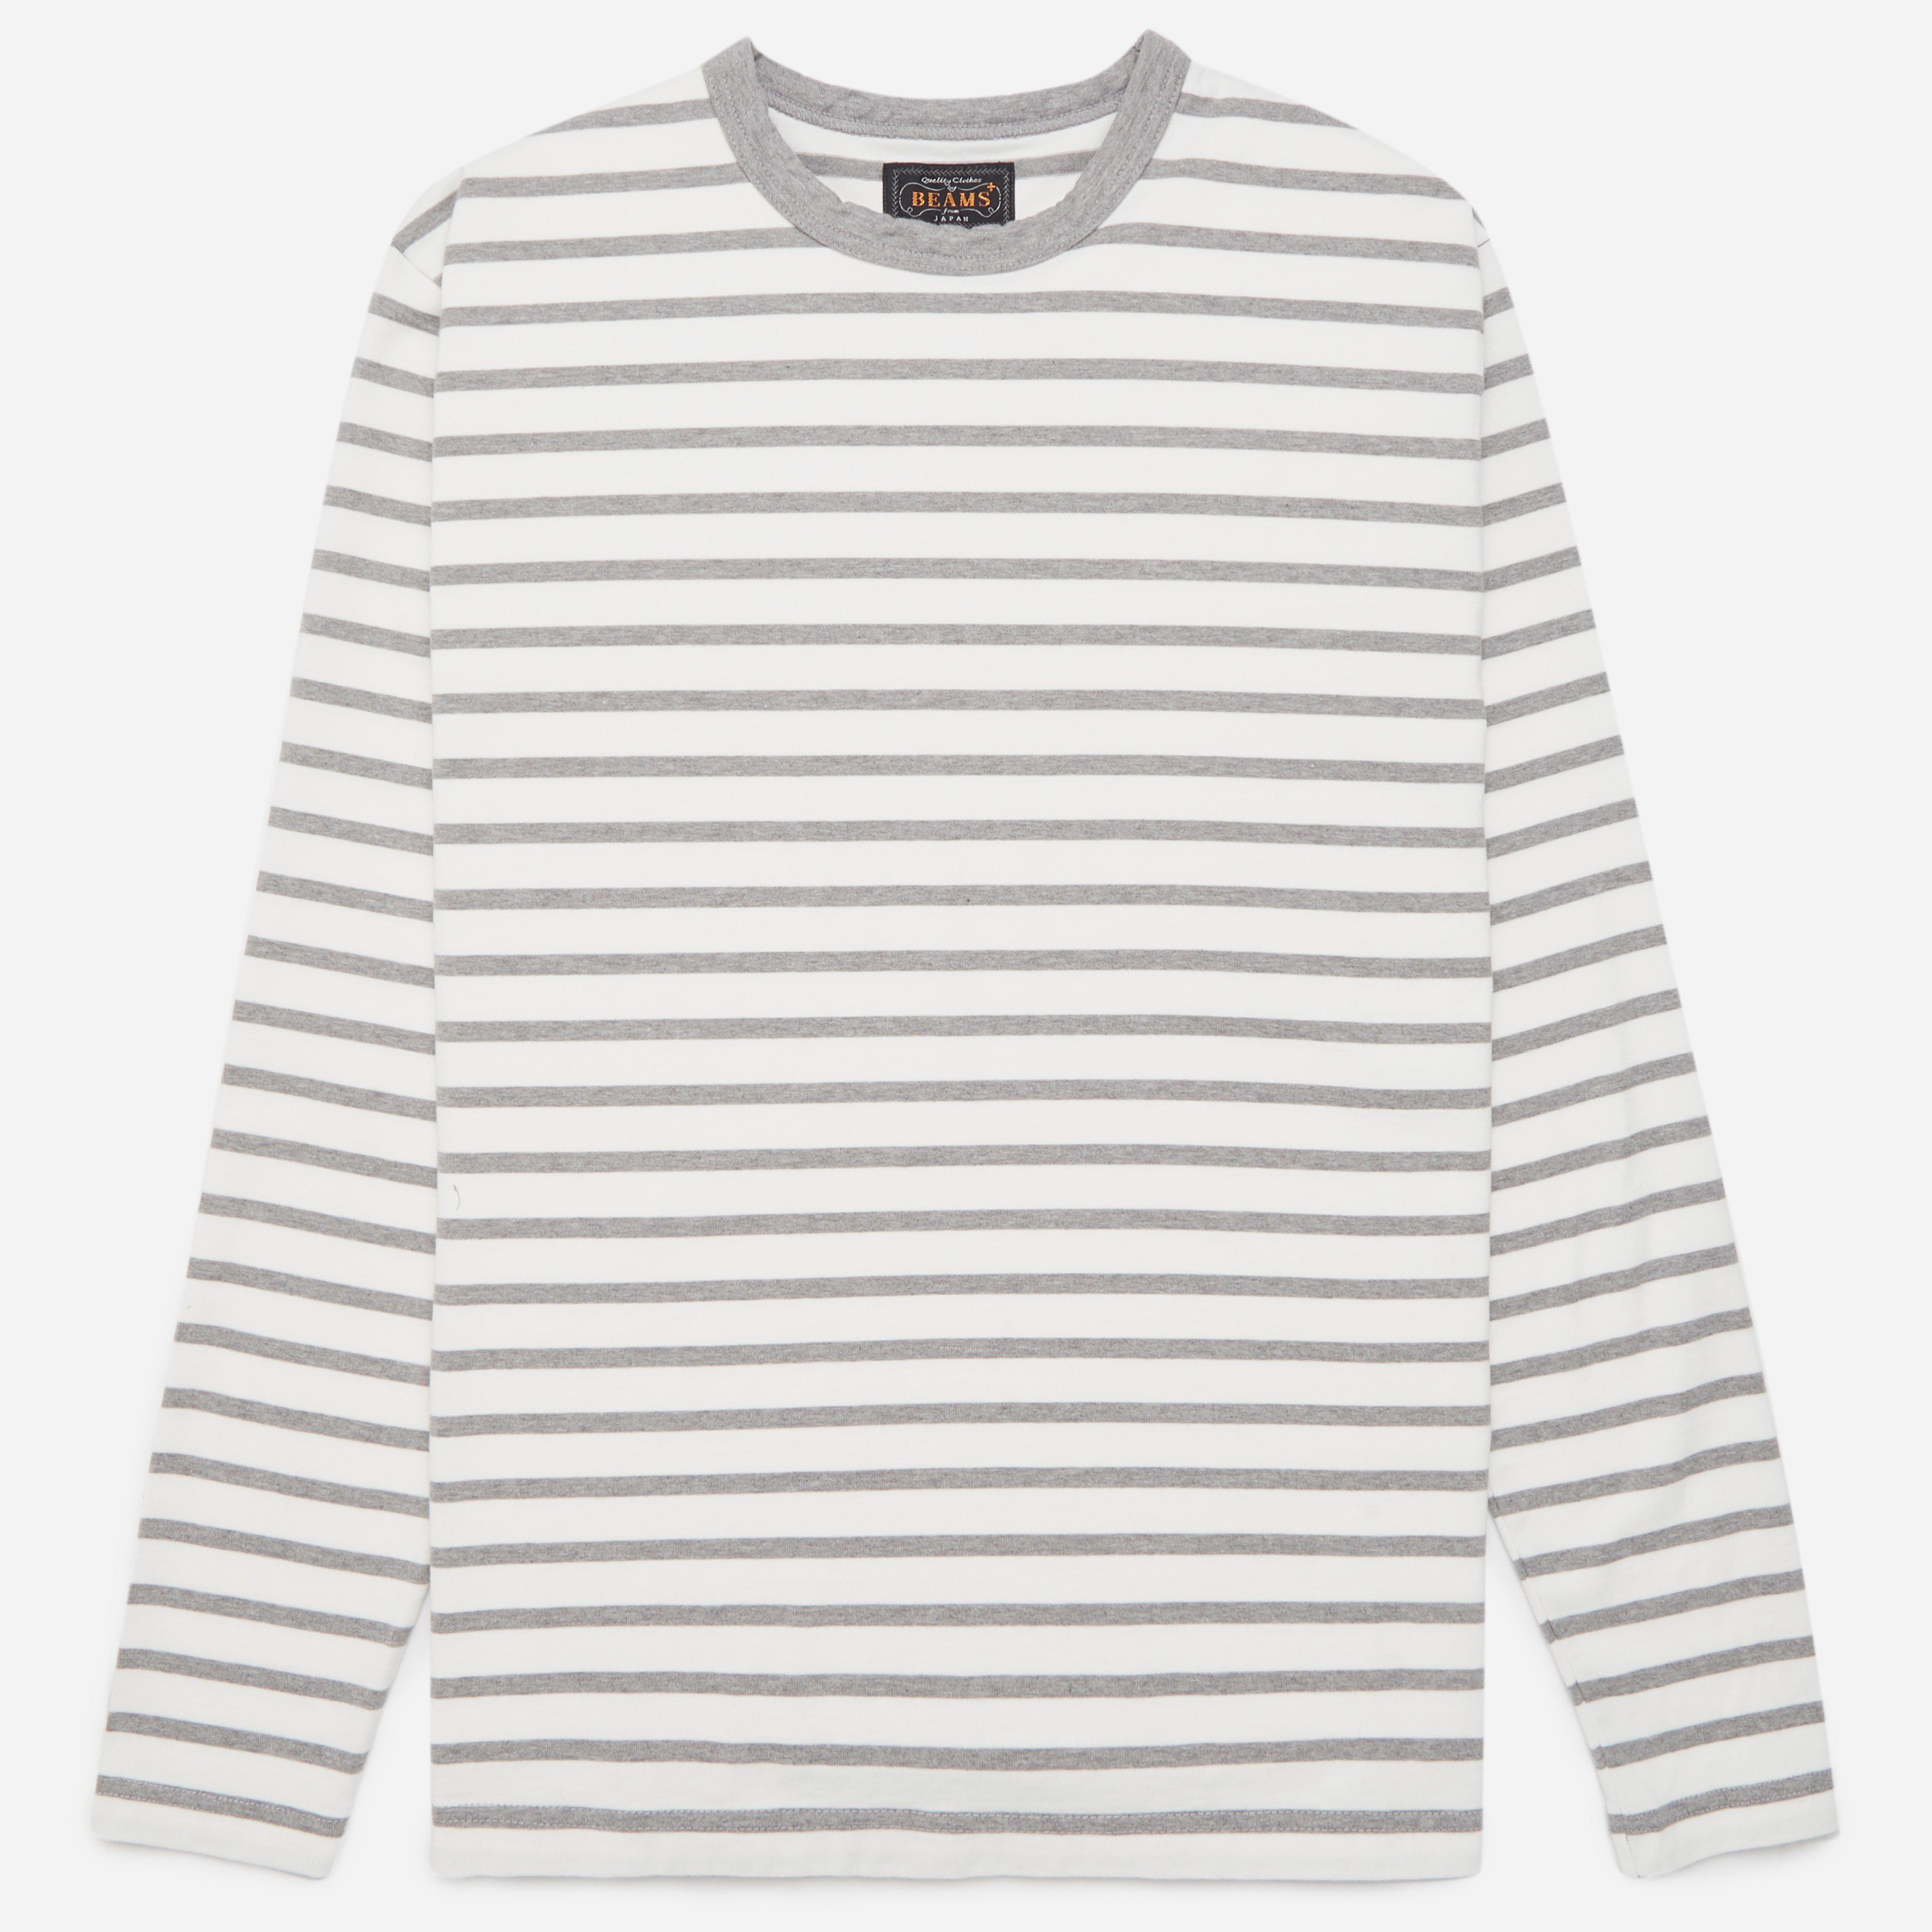 Beams Plus 25/2 Jersey Border Long Sleeve T-shirt